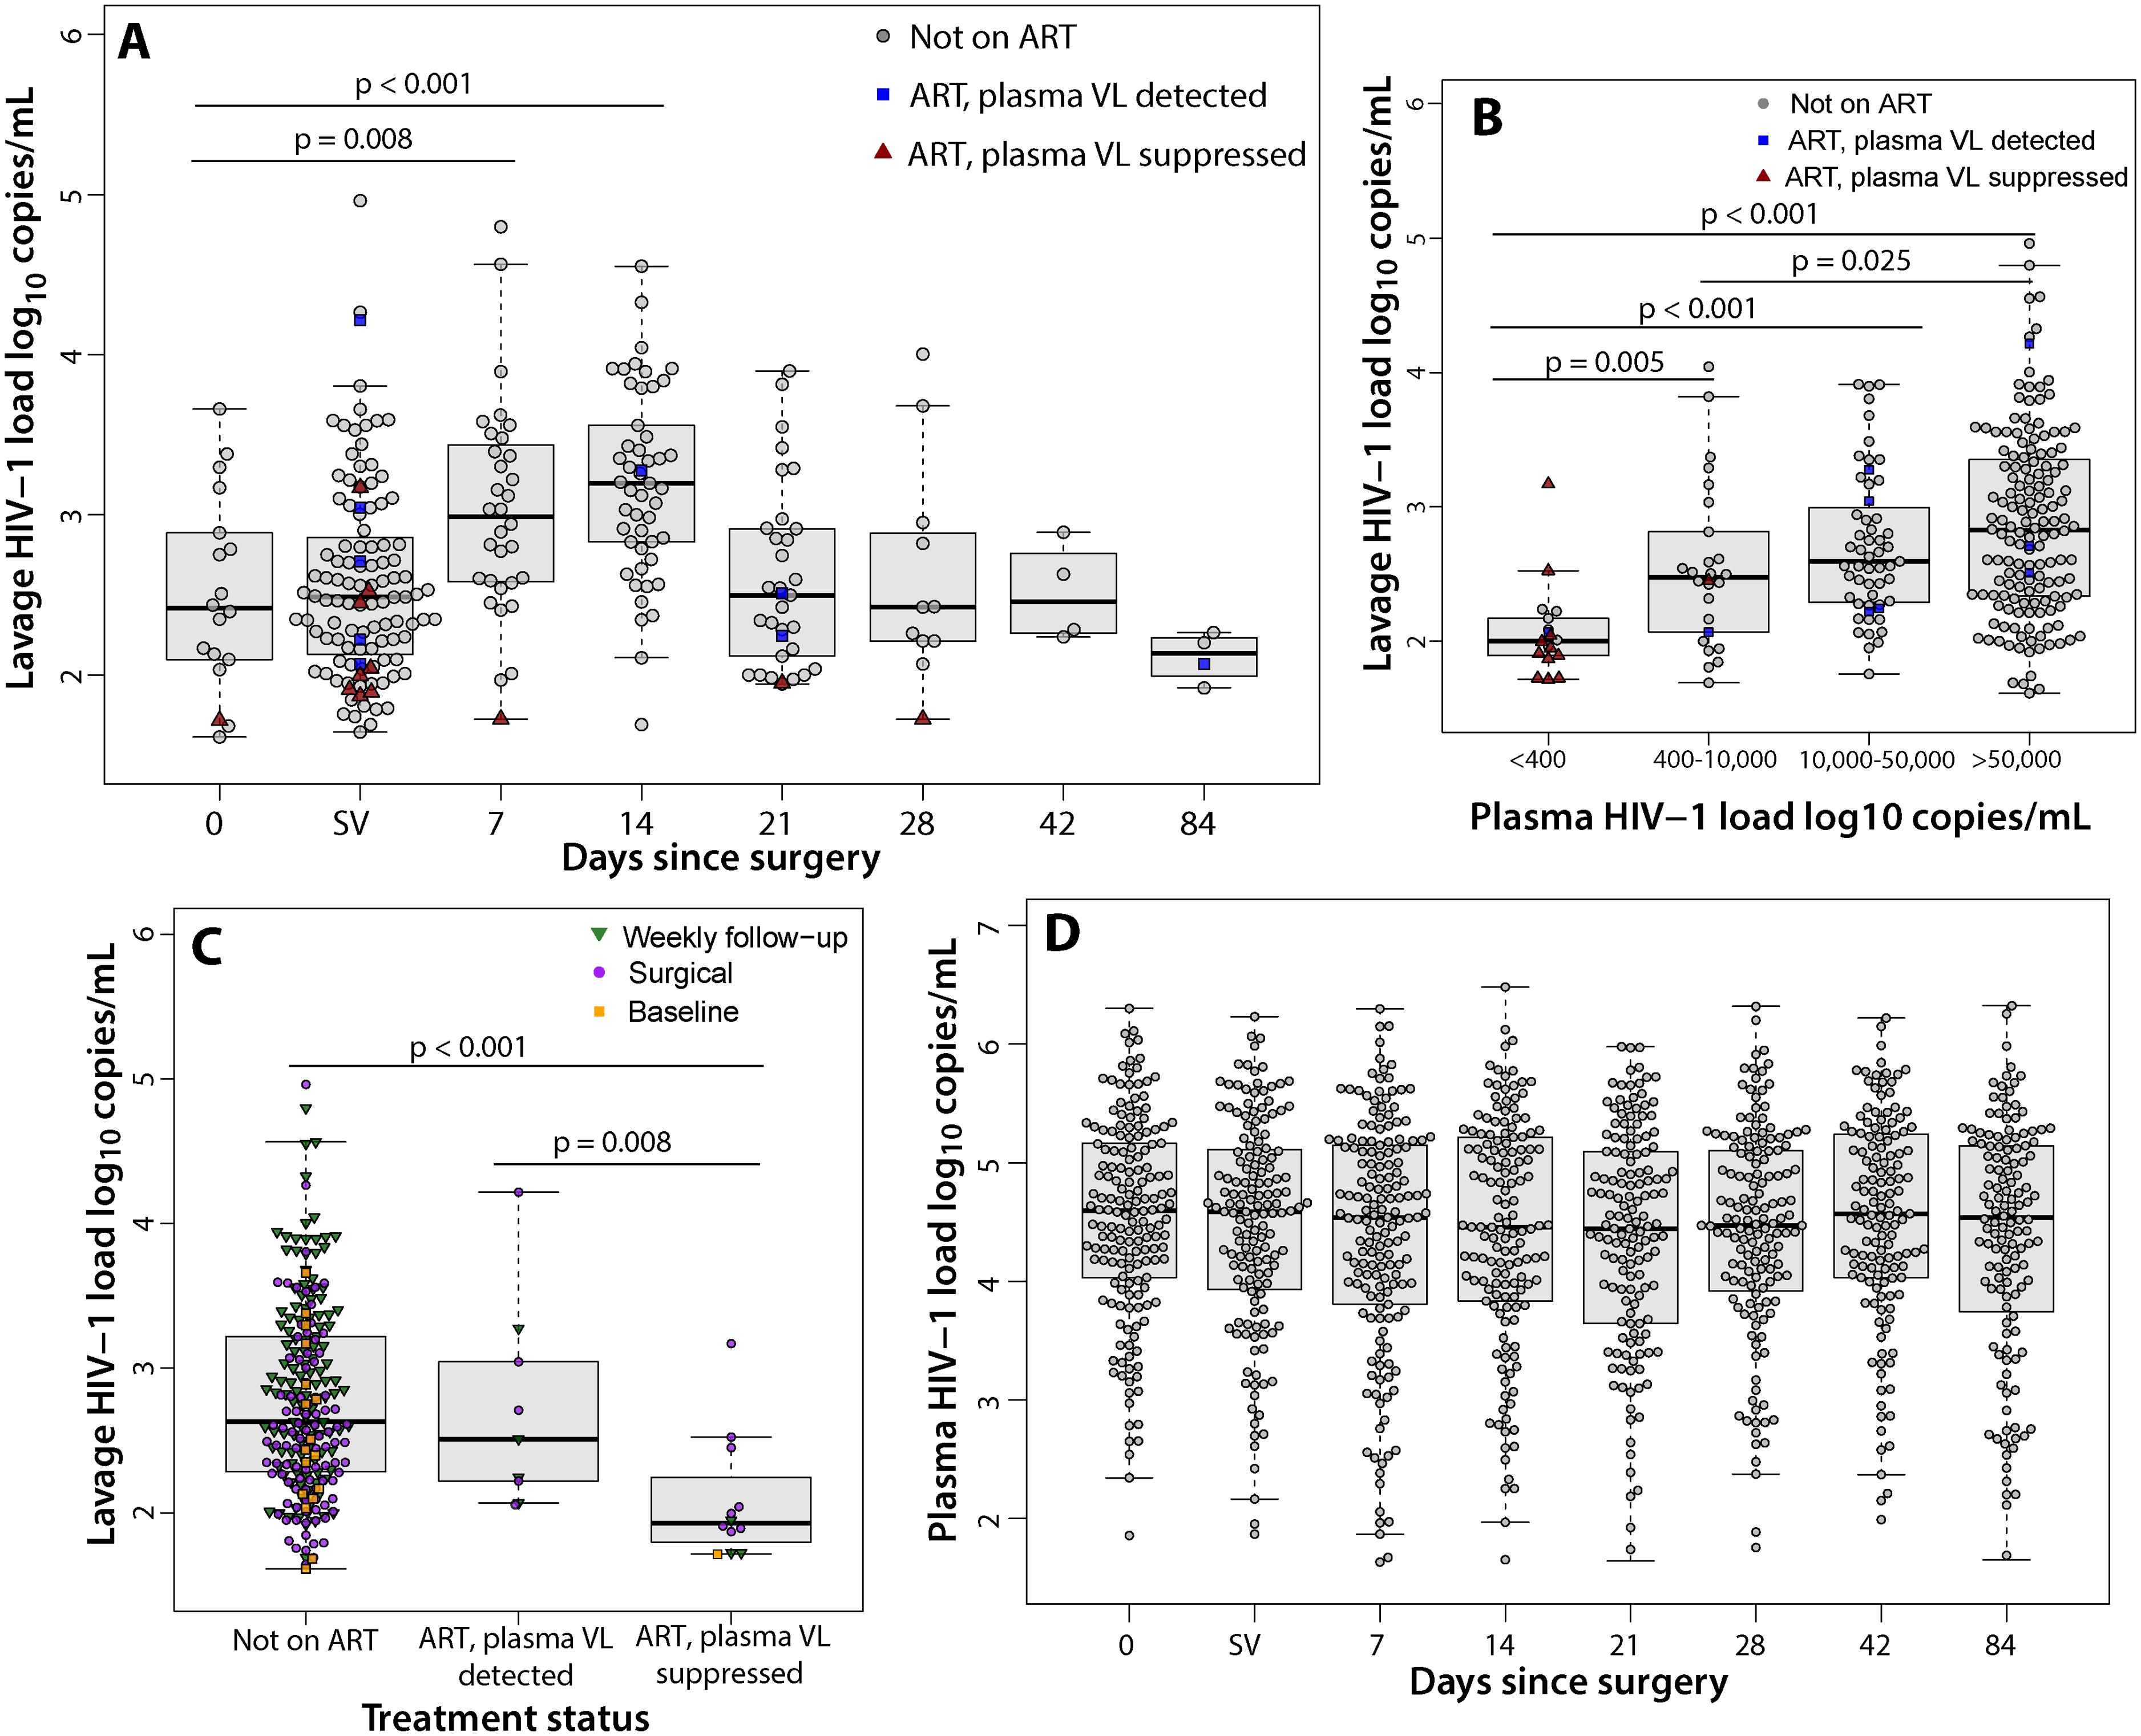 Penile shedding HIV viral load stratified by ART status and plasma viral load.